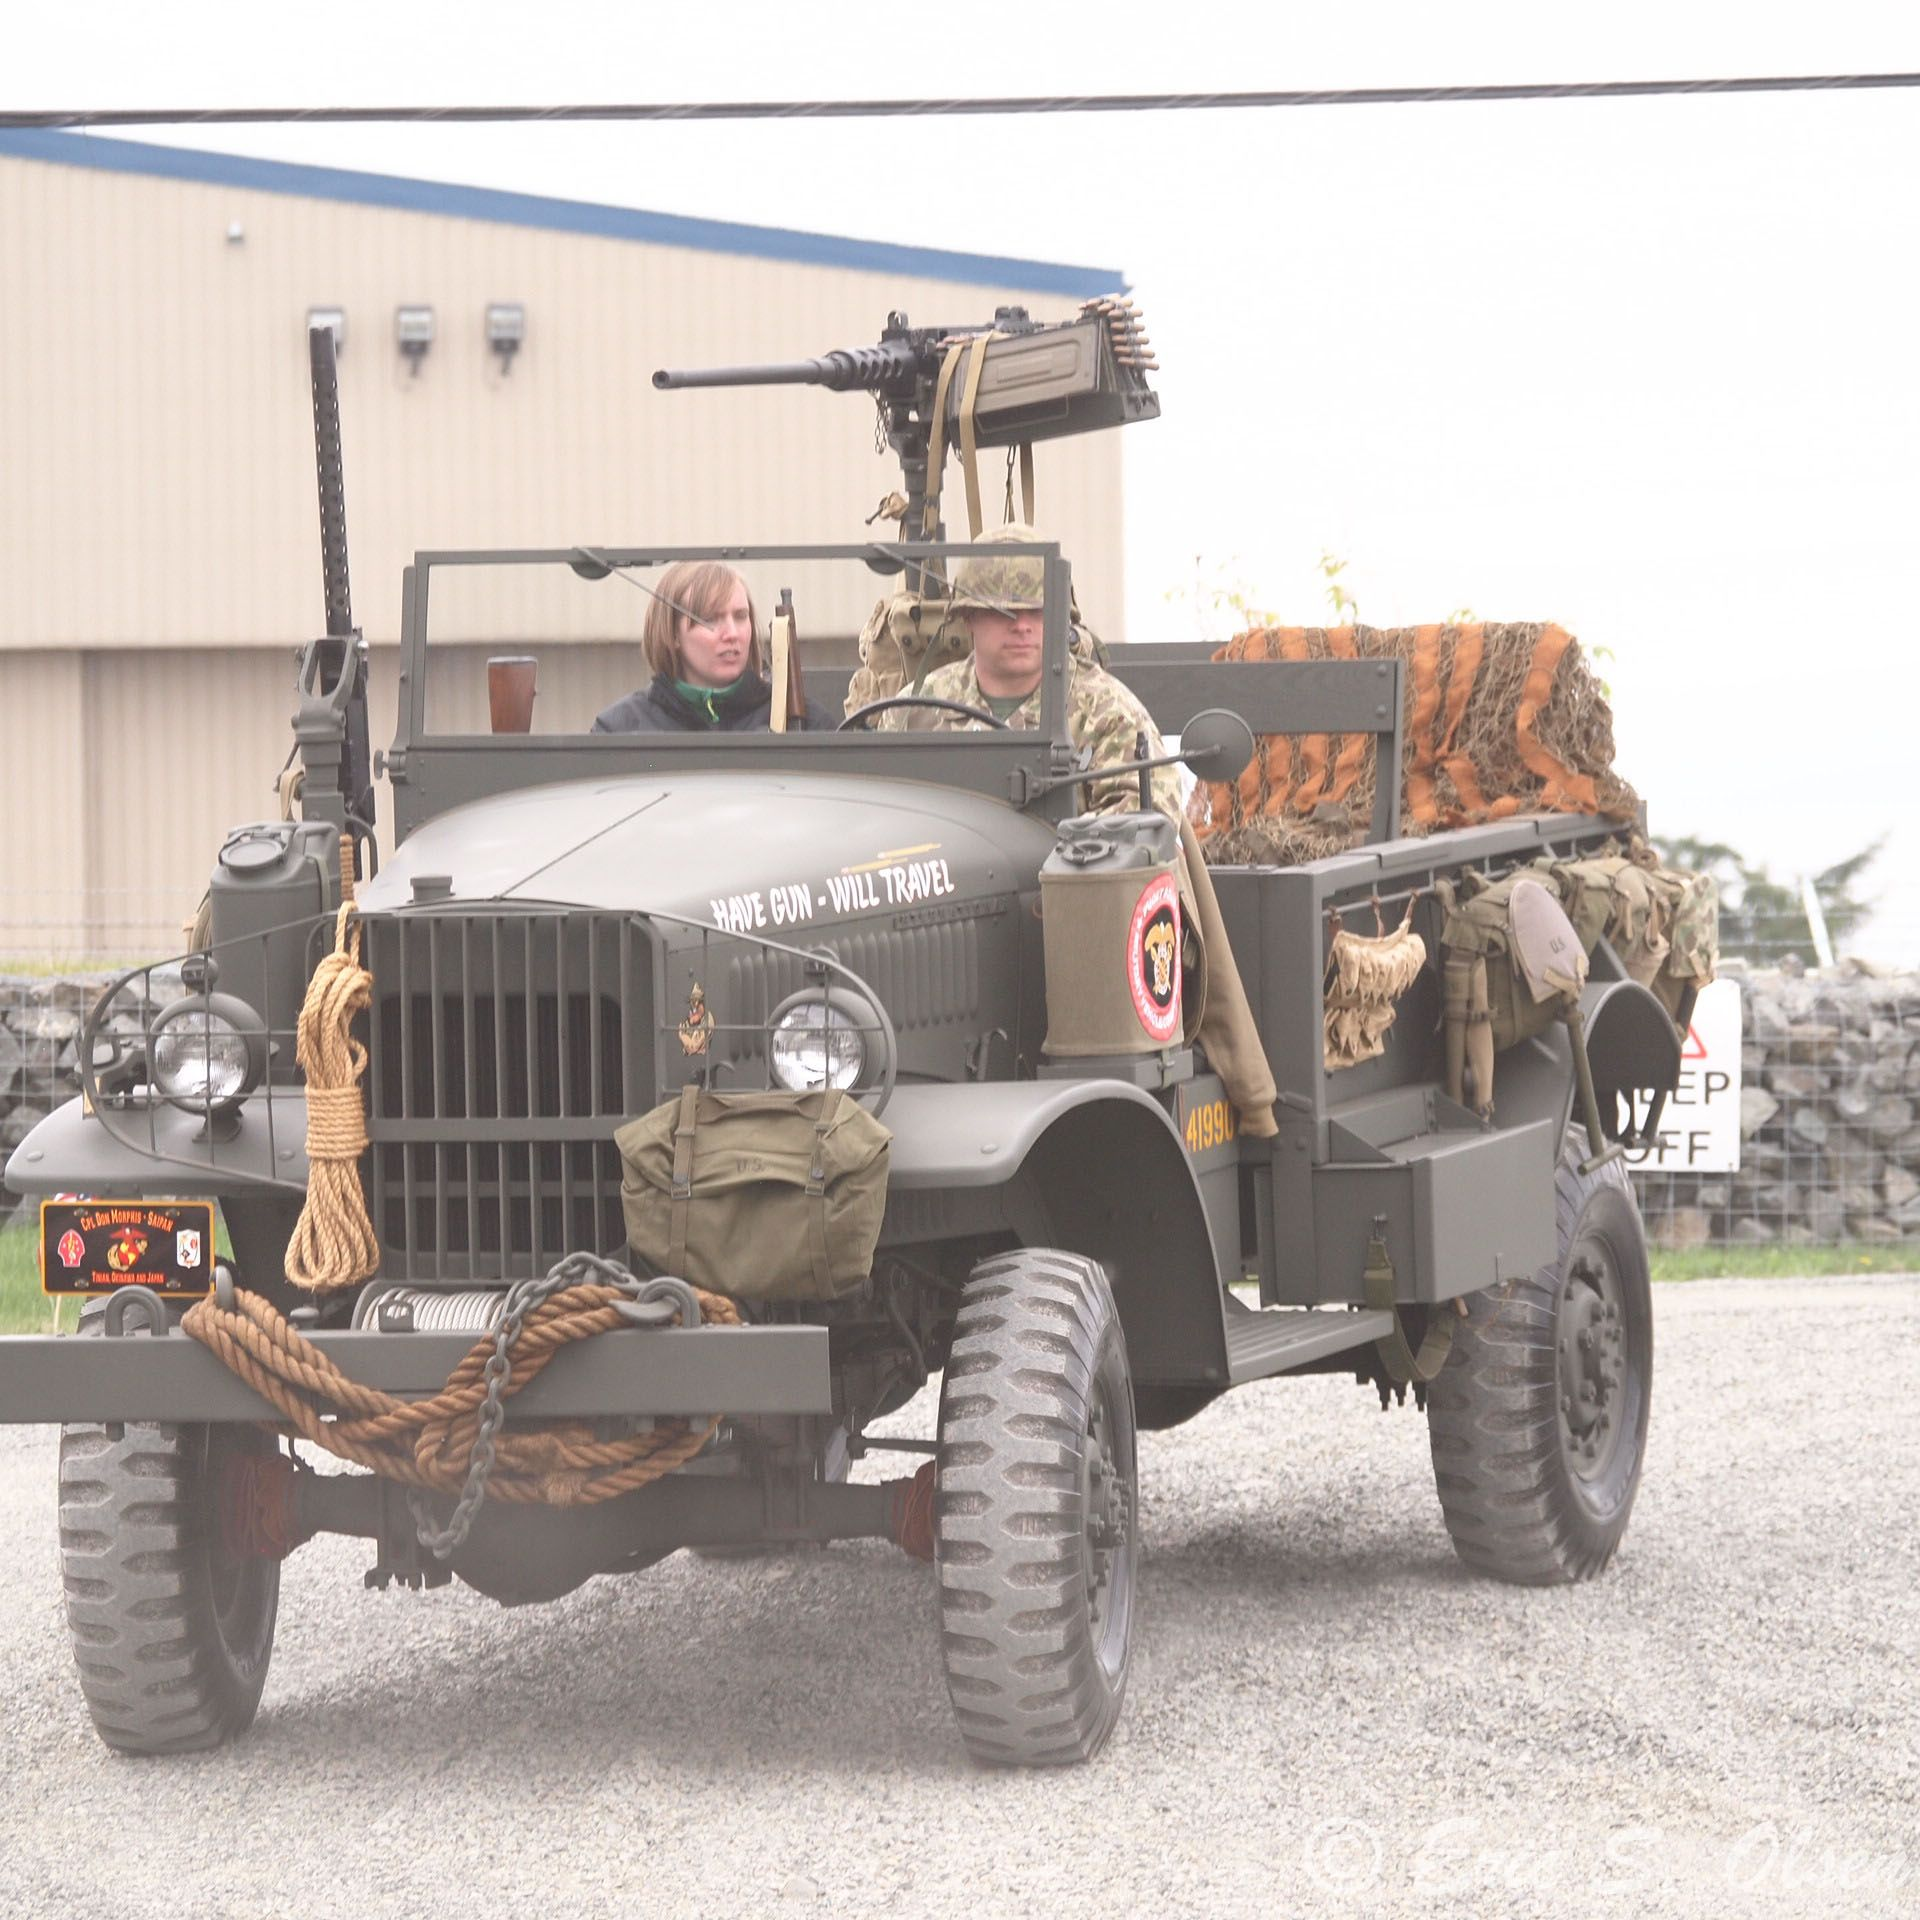 Pin By Eric Waddell On Dodge Trucks: International M-2-4 4x4 Cargo Truck.